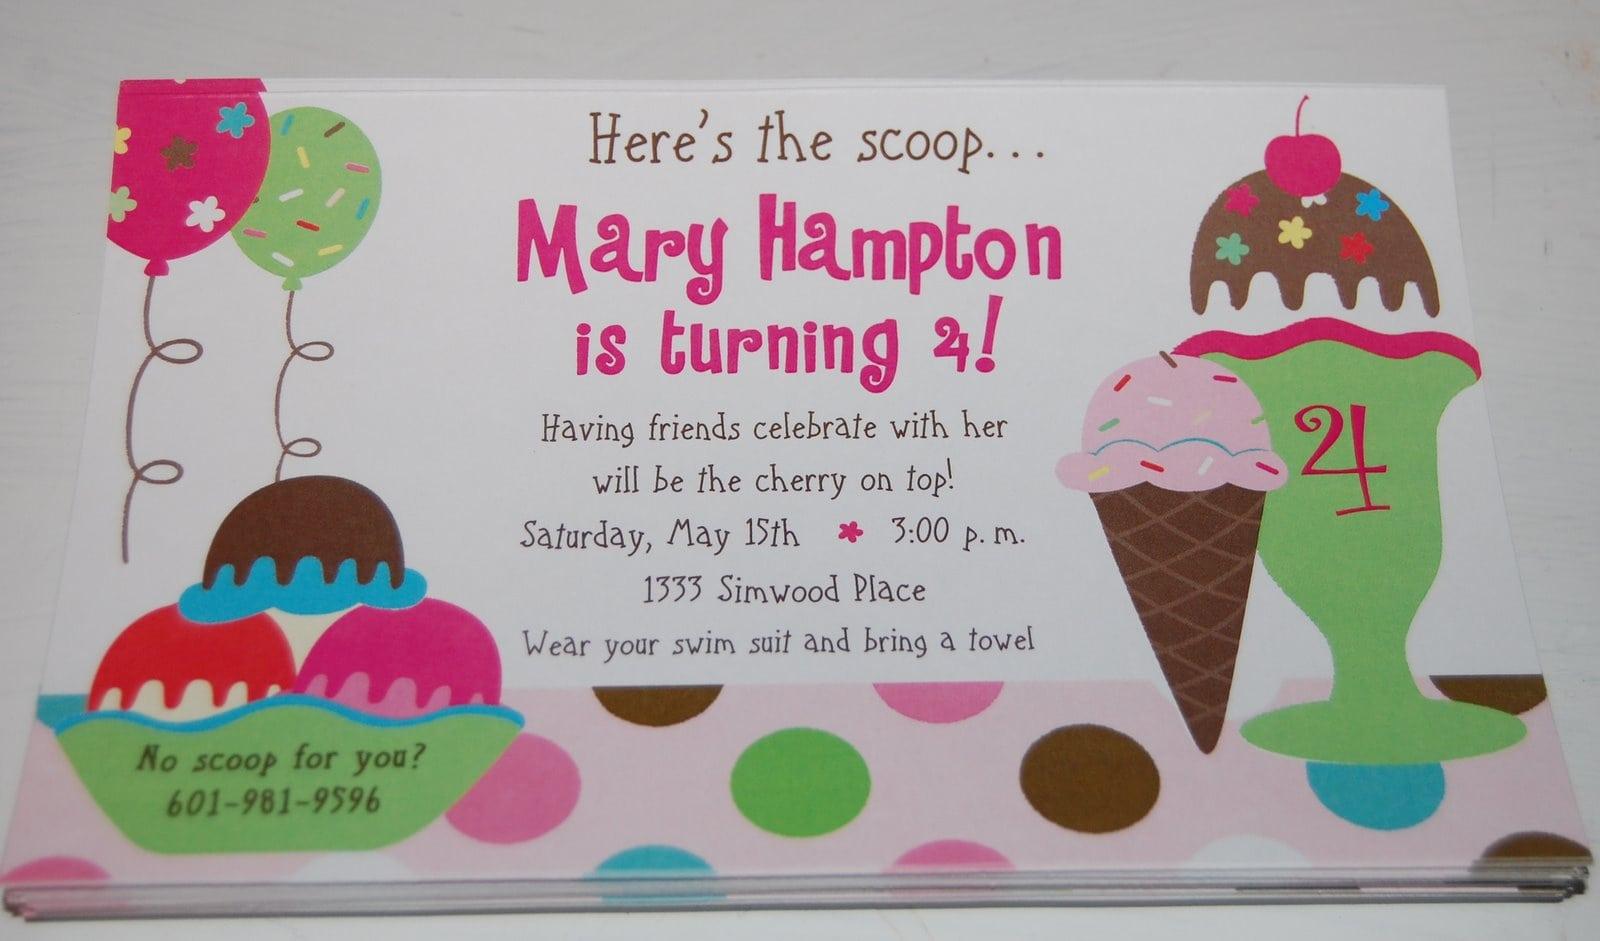 Baby Face Design  Ice Cream Sundae Birthday Party Invitation